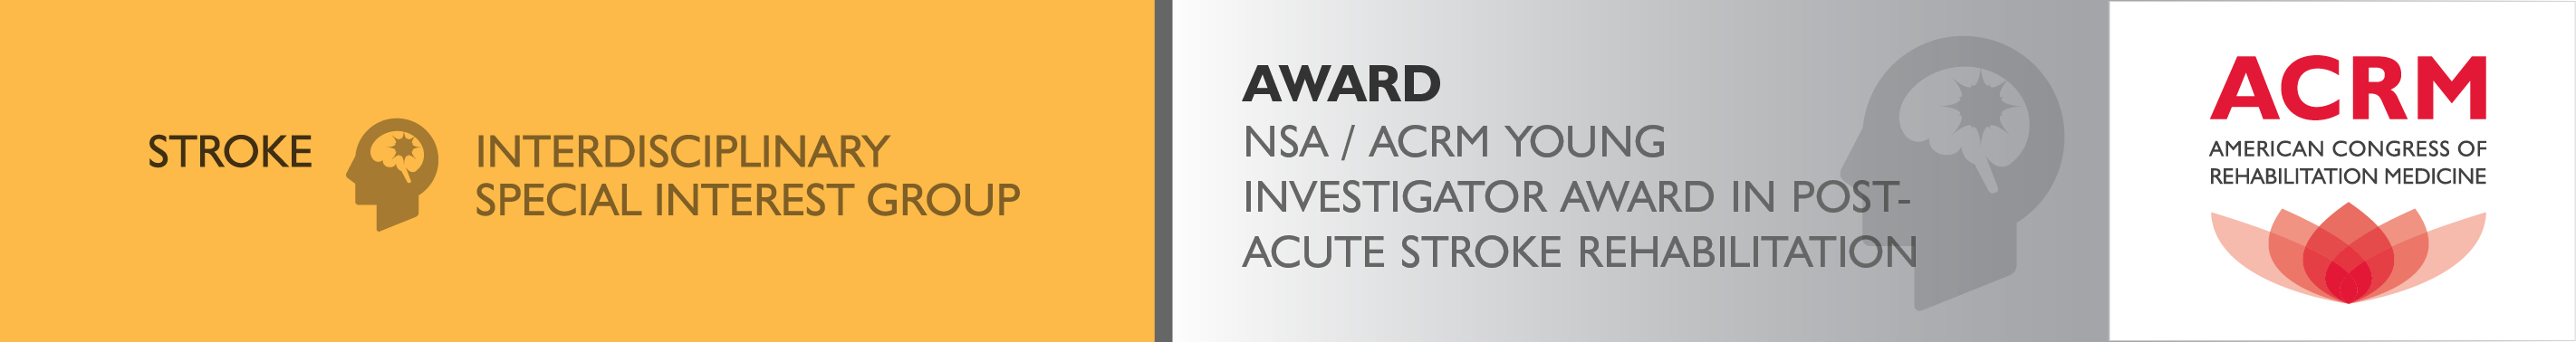 Award NSA / ACRM Young Investigator Award in Post-Acute Stroke Rehabilitation